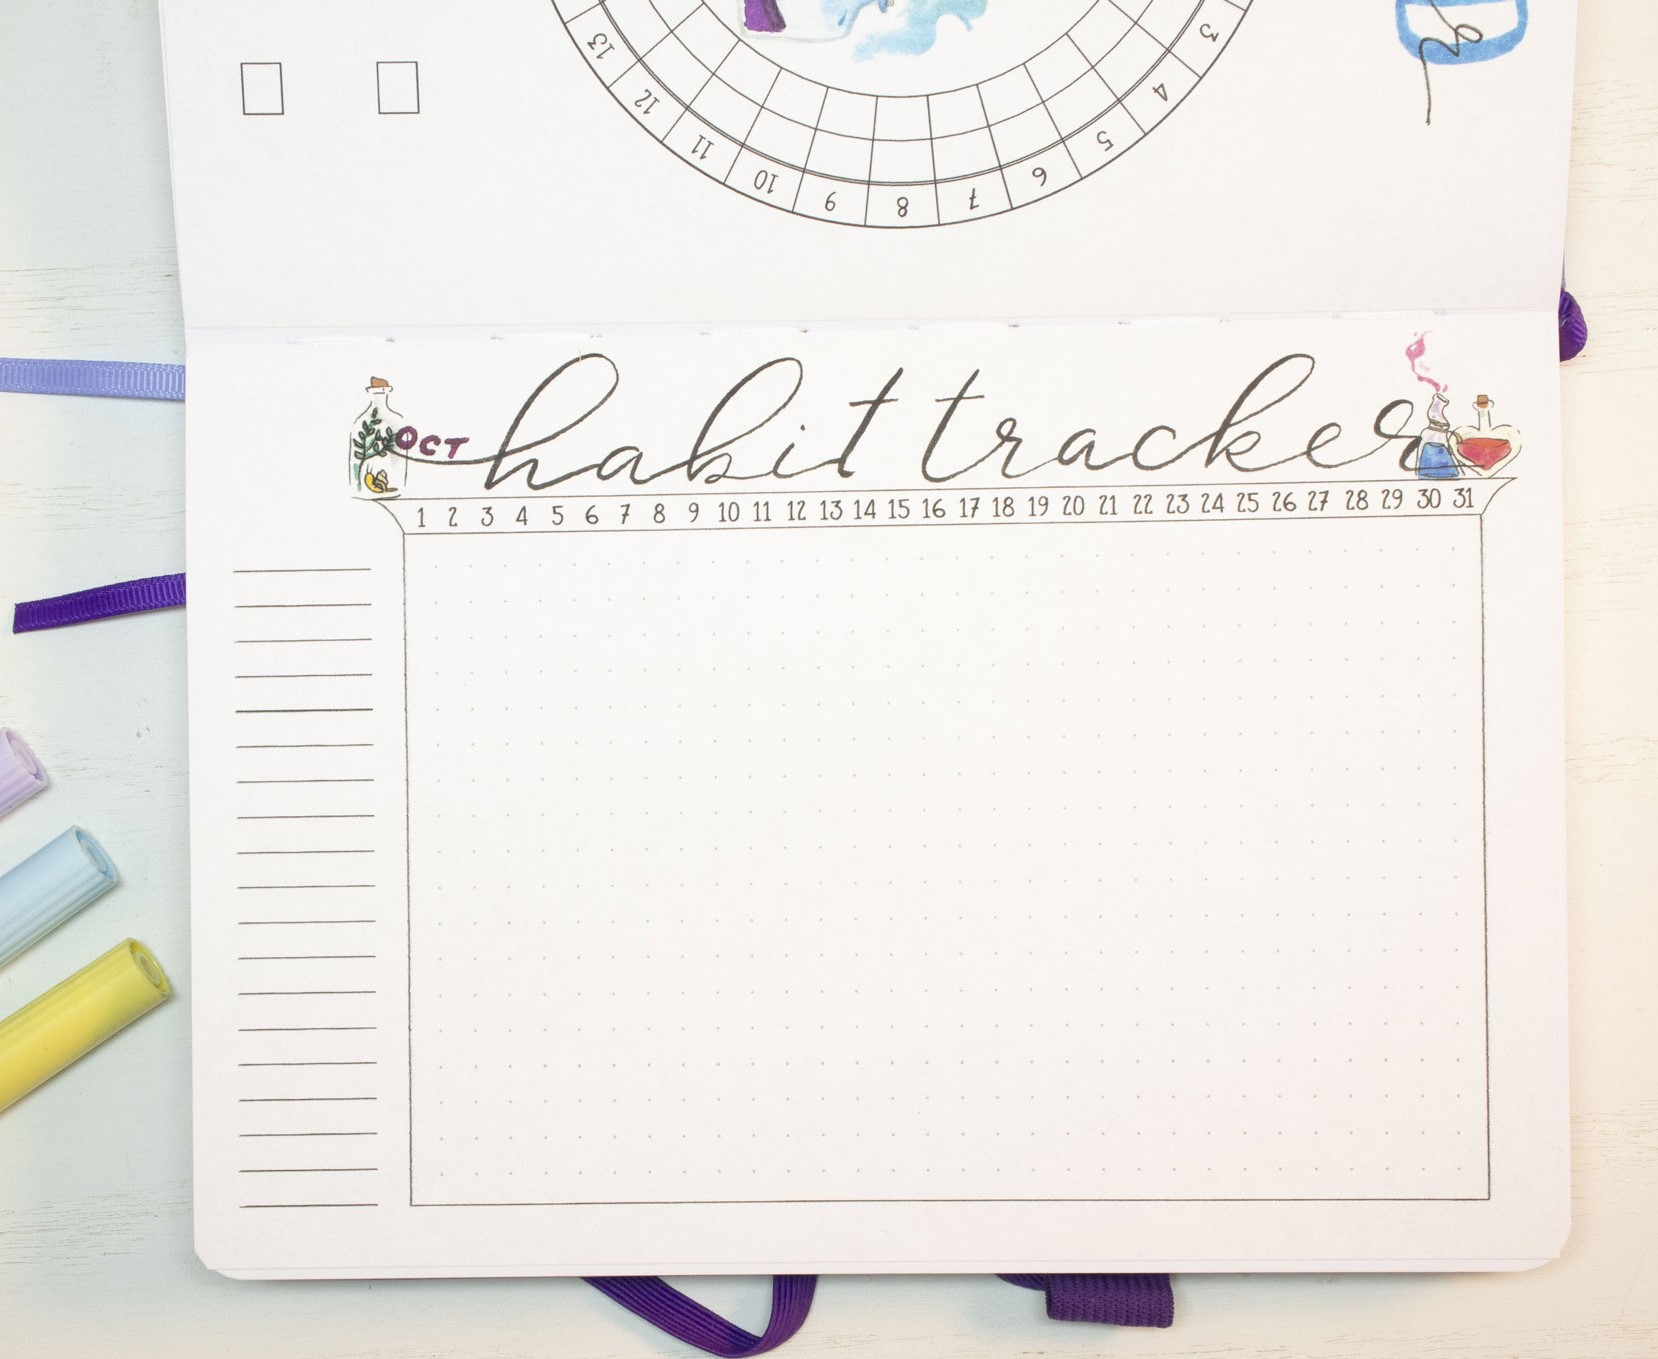 October 2020 Bullet Journal habit tracker page.